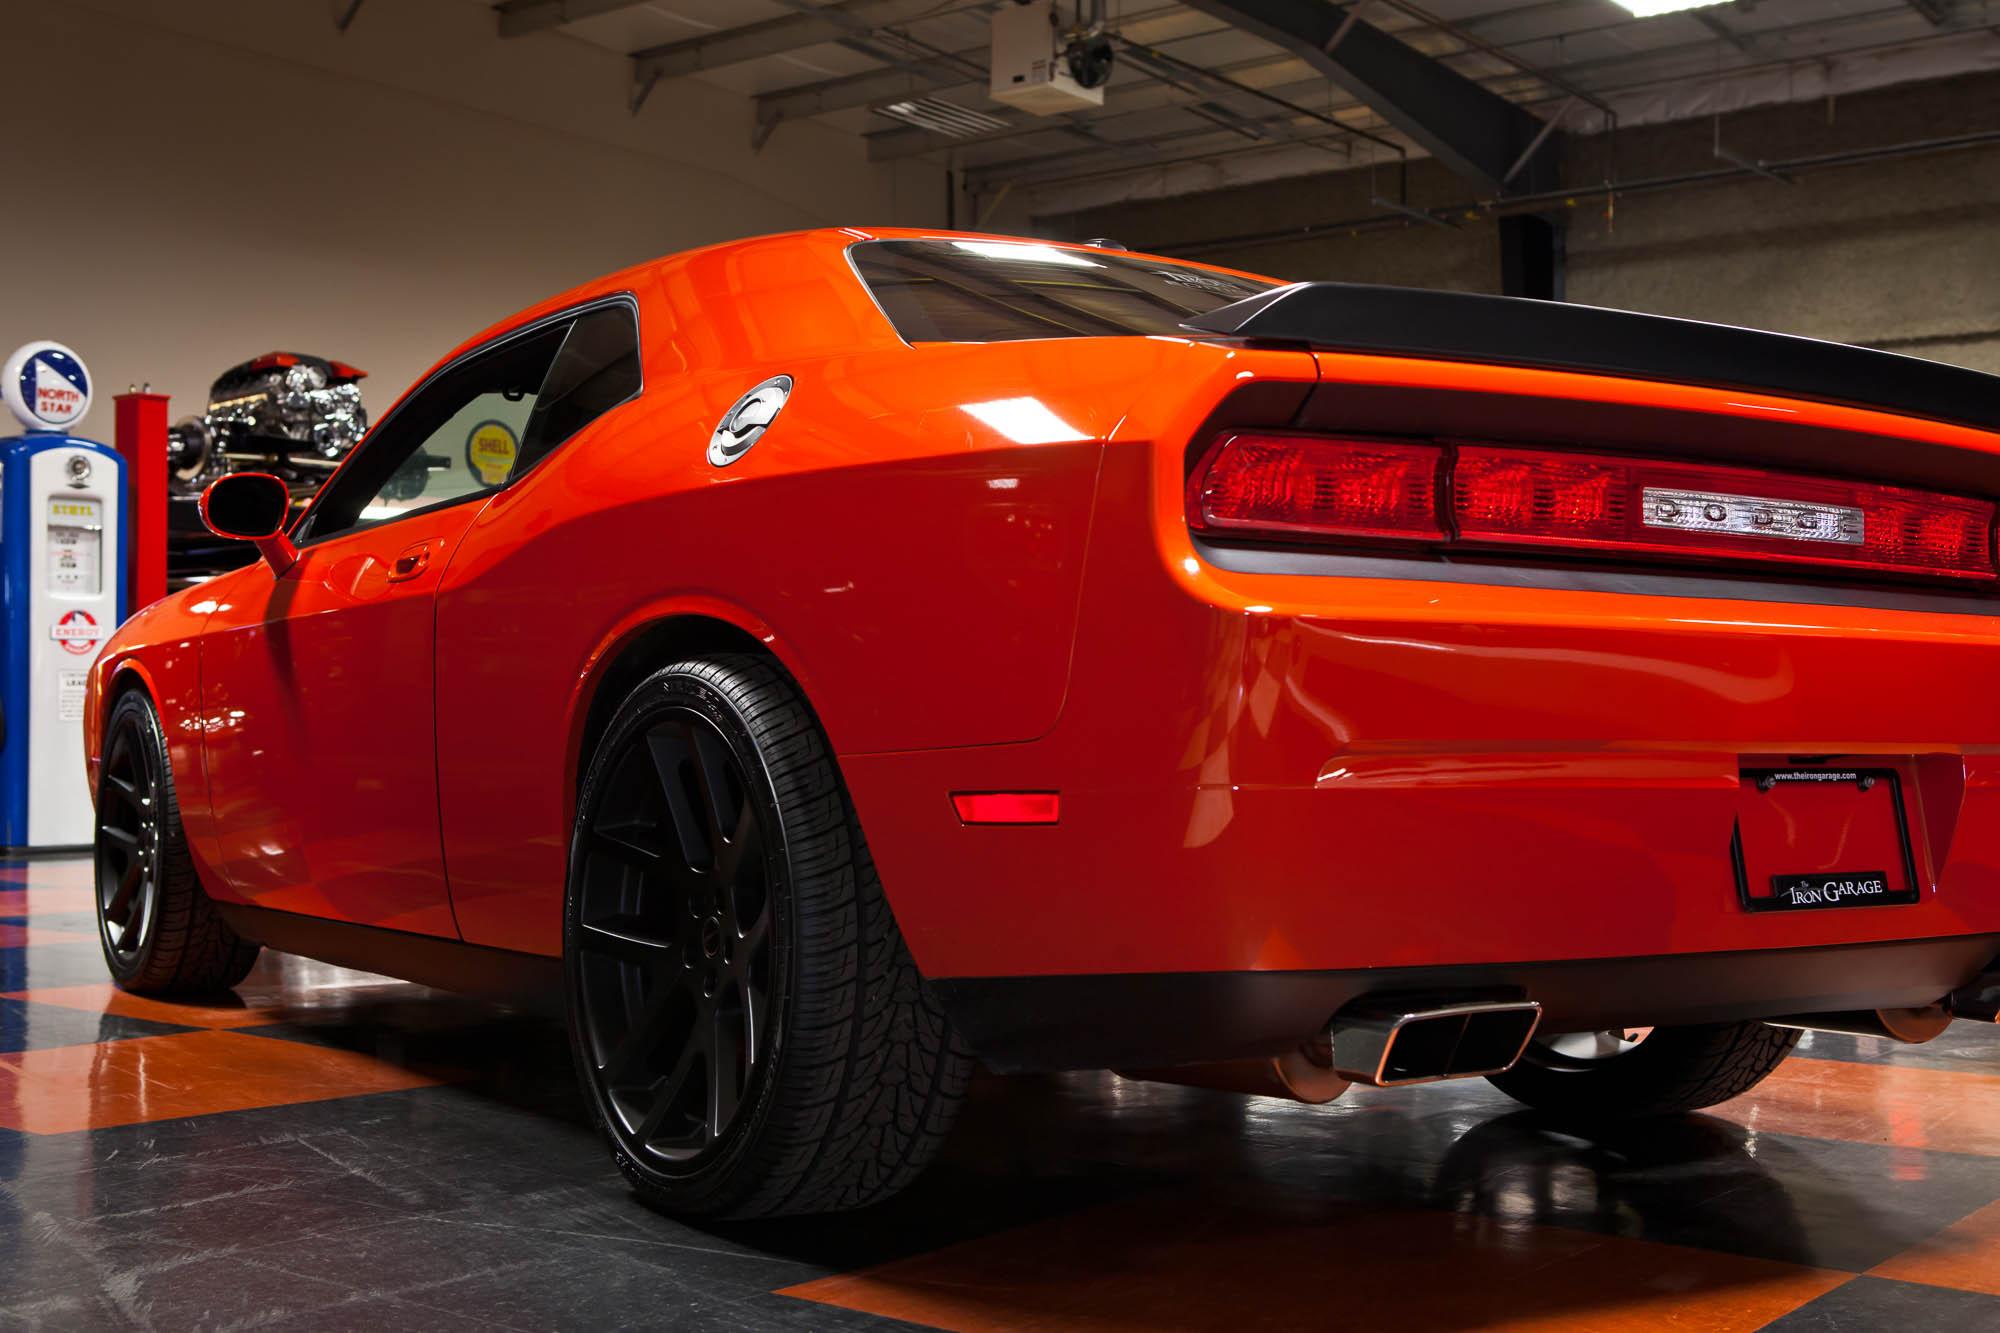 2009 Iron Edition Challenger SRT8 - Sold - The Iron Garage